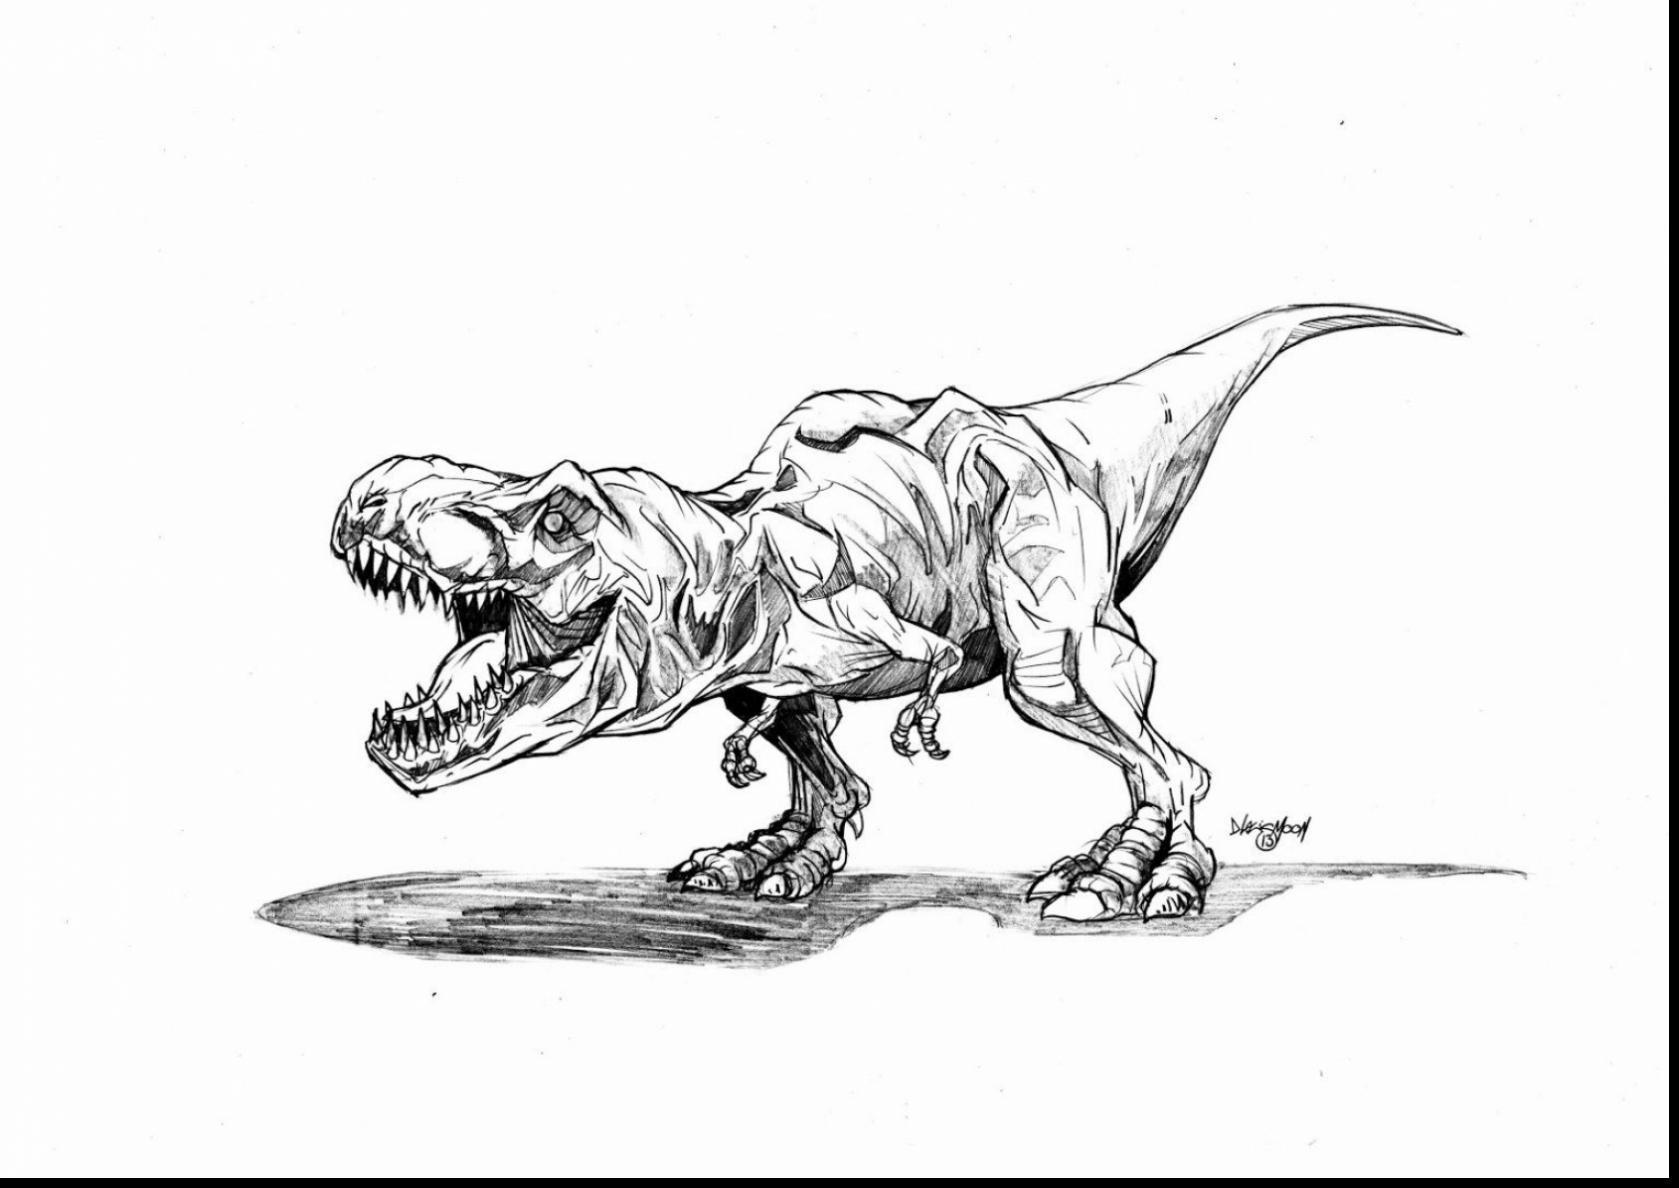 Ausmalbilder Jurassic World Inspirierend Jurassic Park Coloring Pages Stock